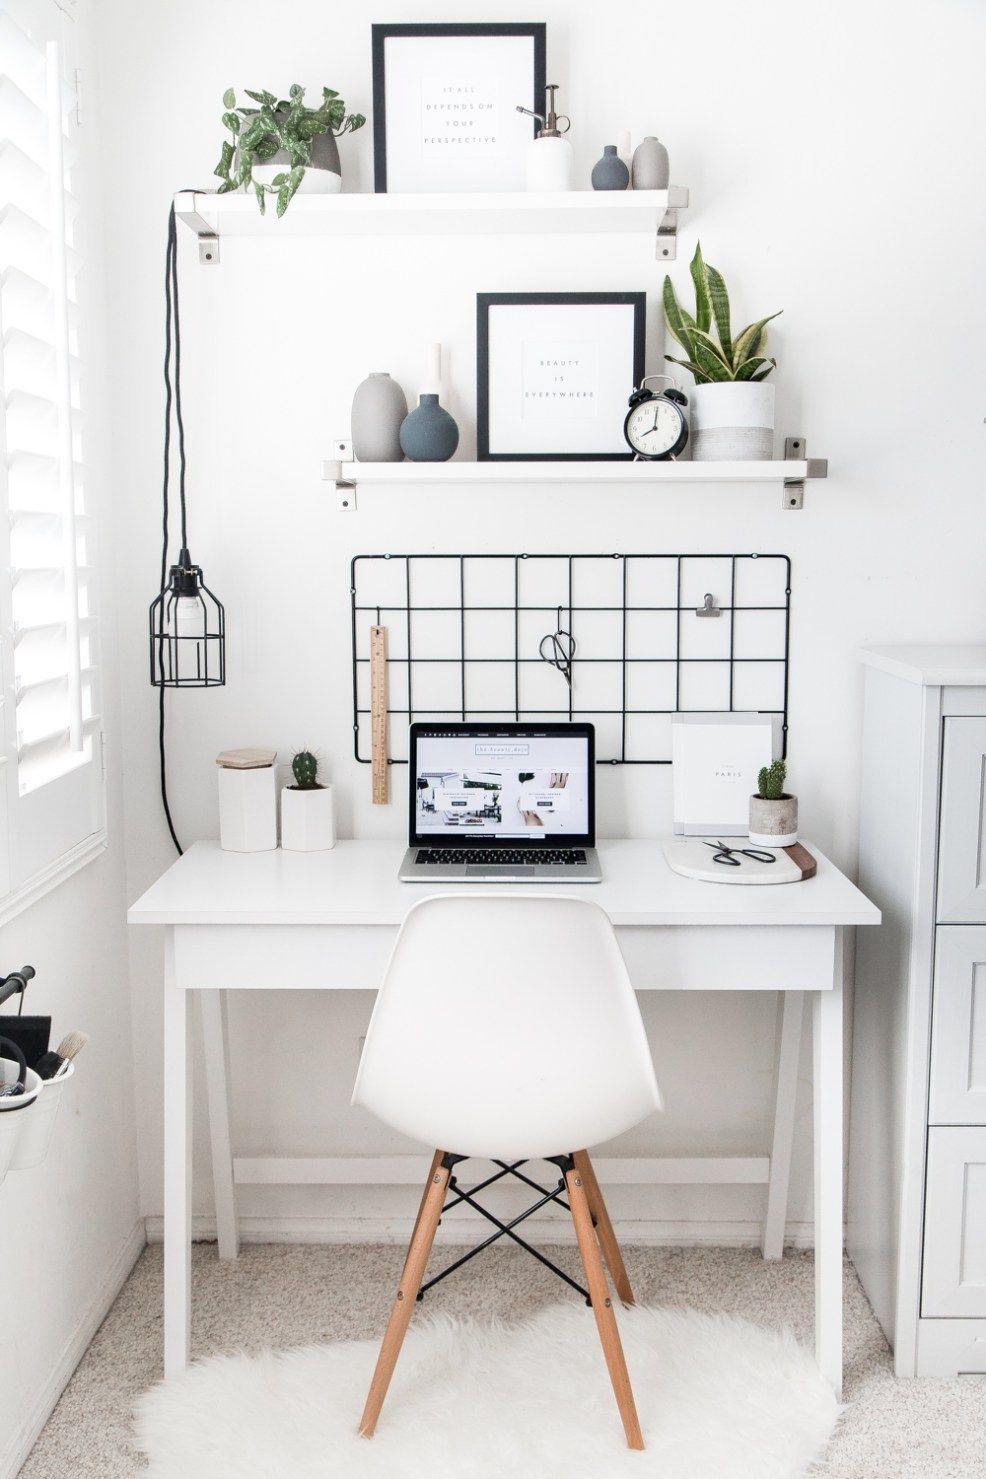 DIY Minimalist Caged Light Fixture Minimalist home decor